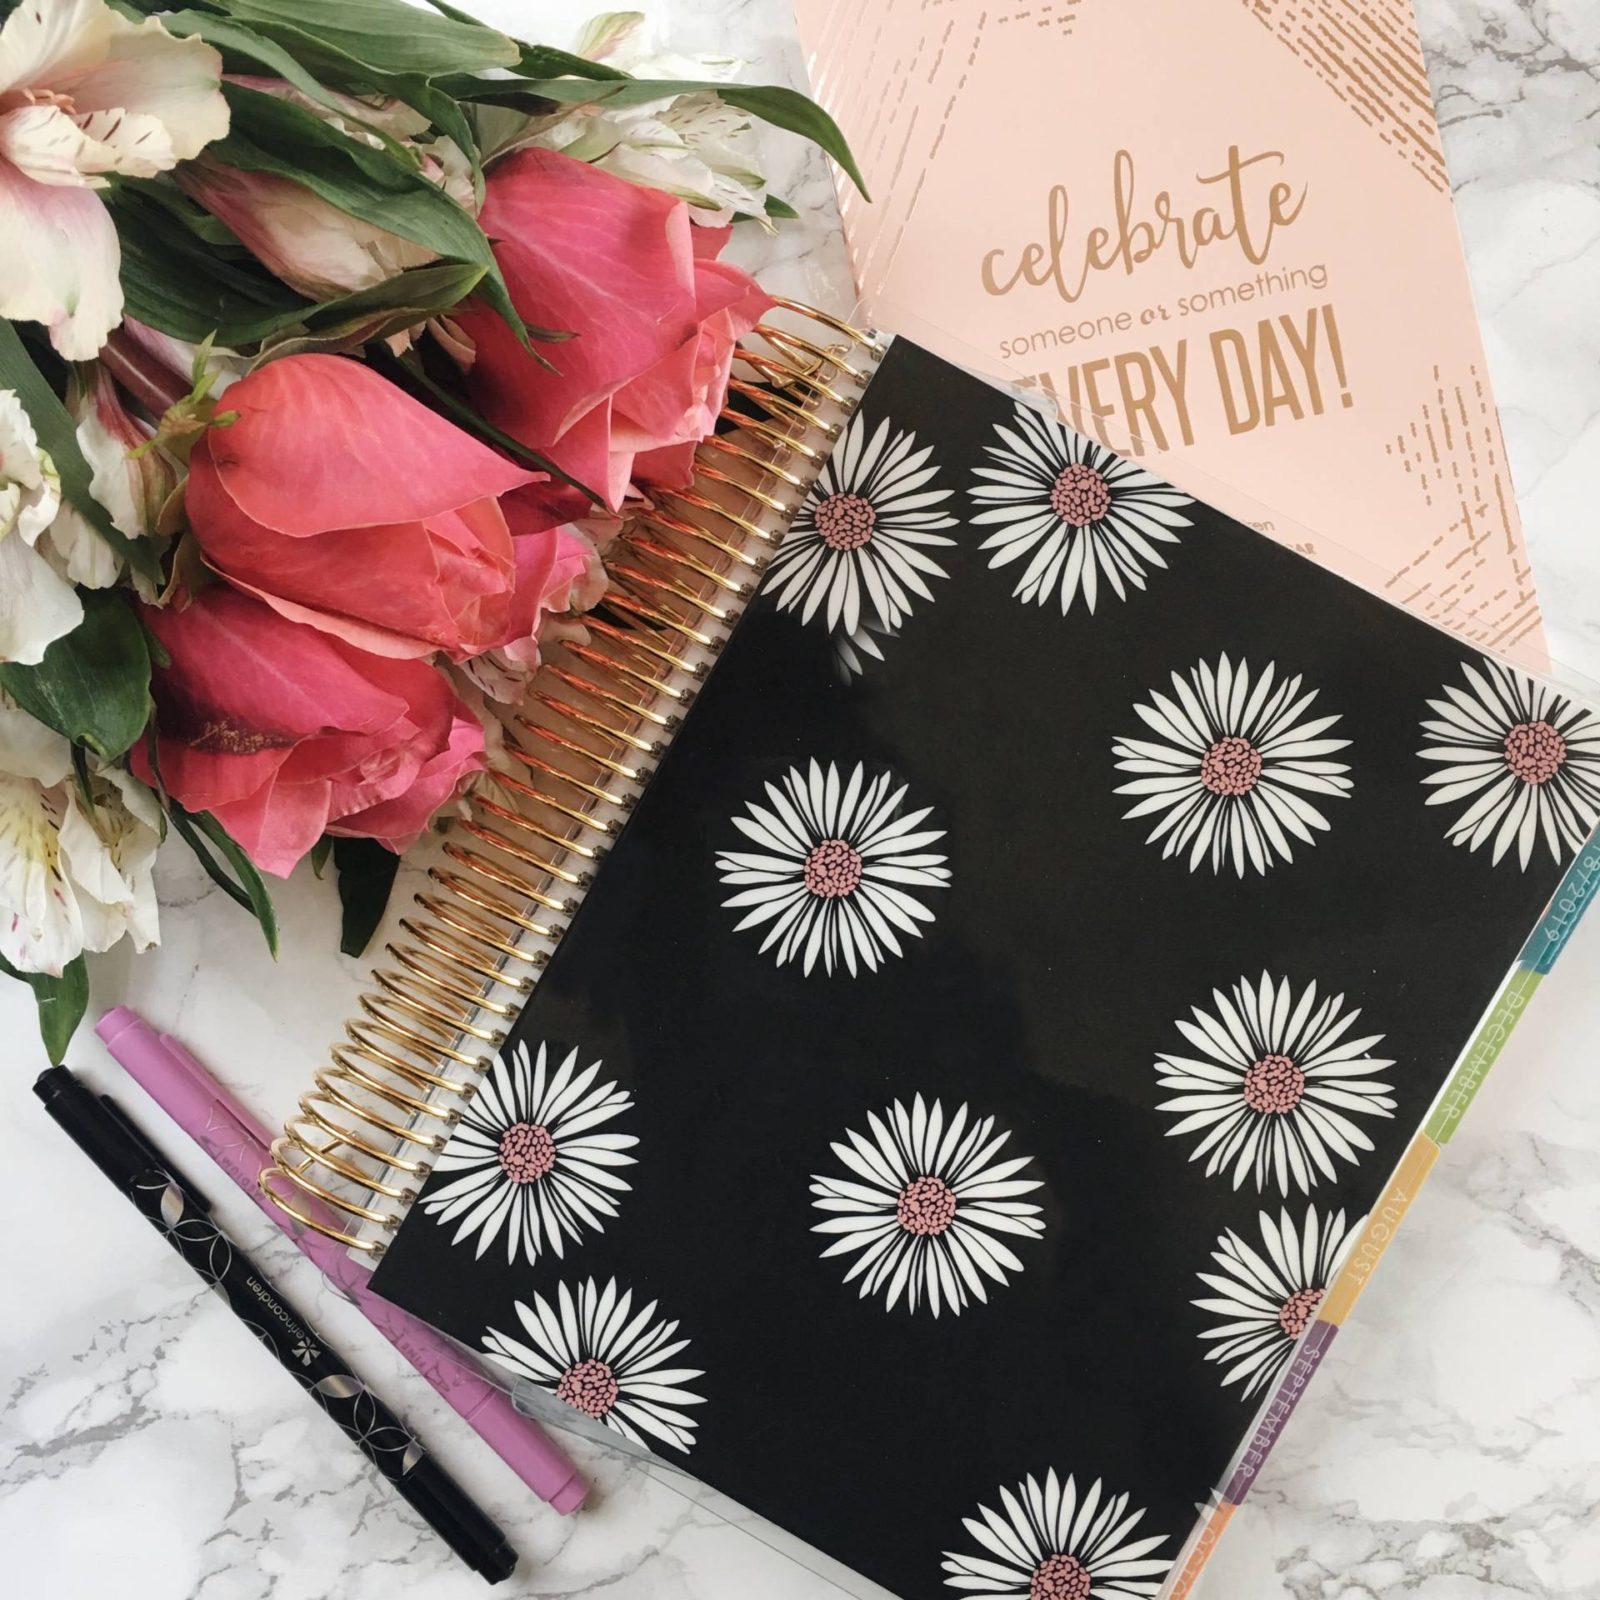 The Best Planner for 2019- Erin Condren_LeFabChic